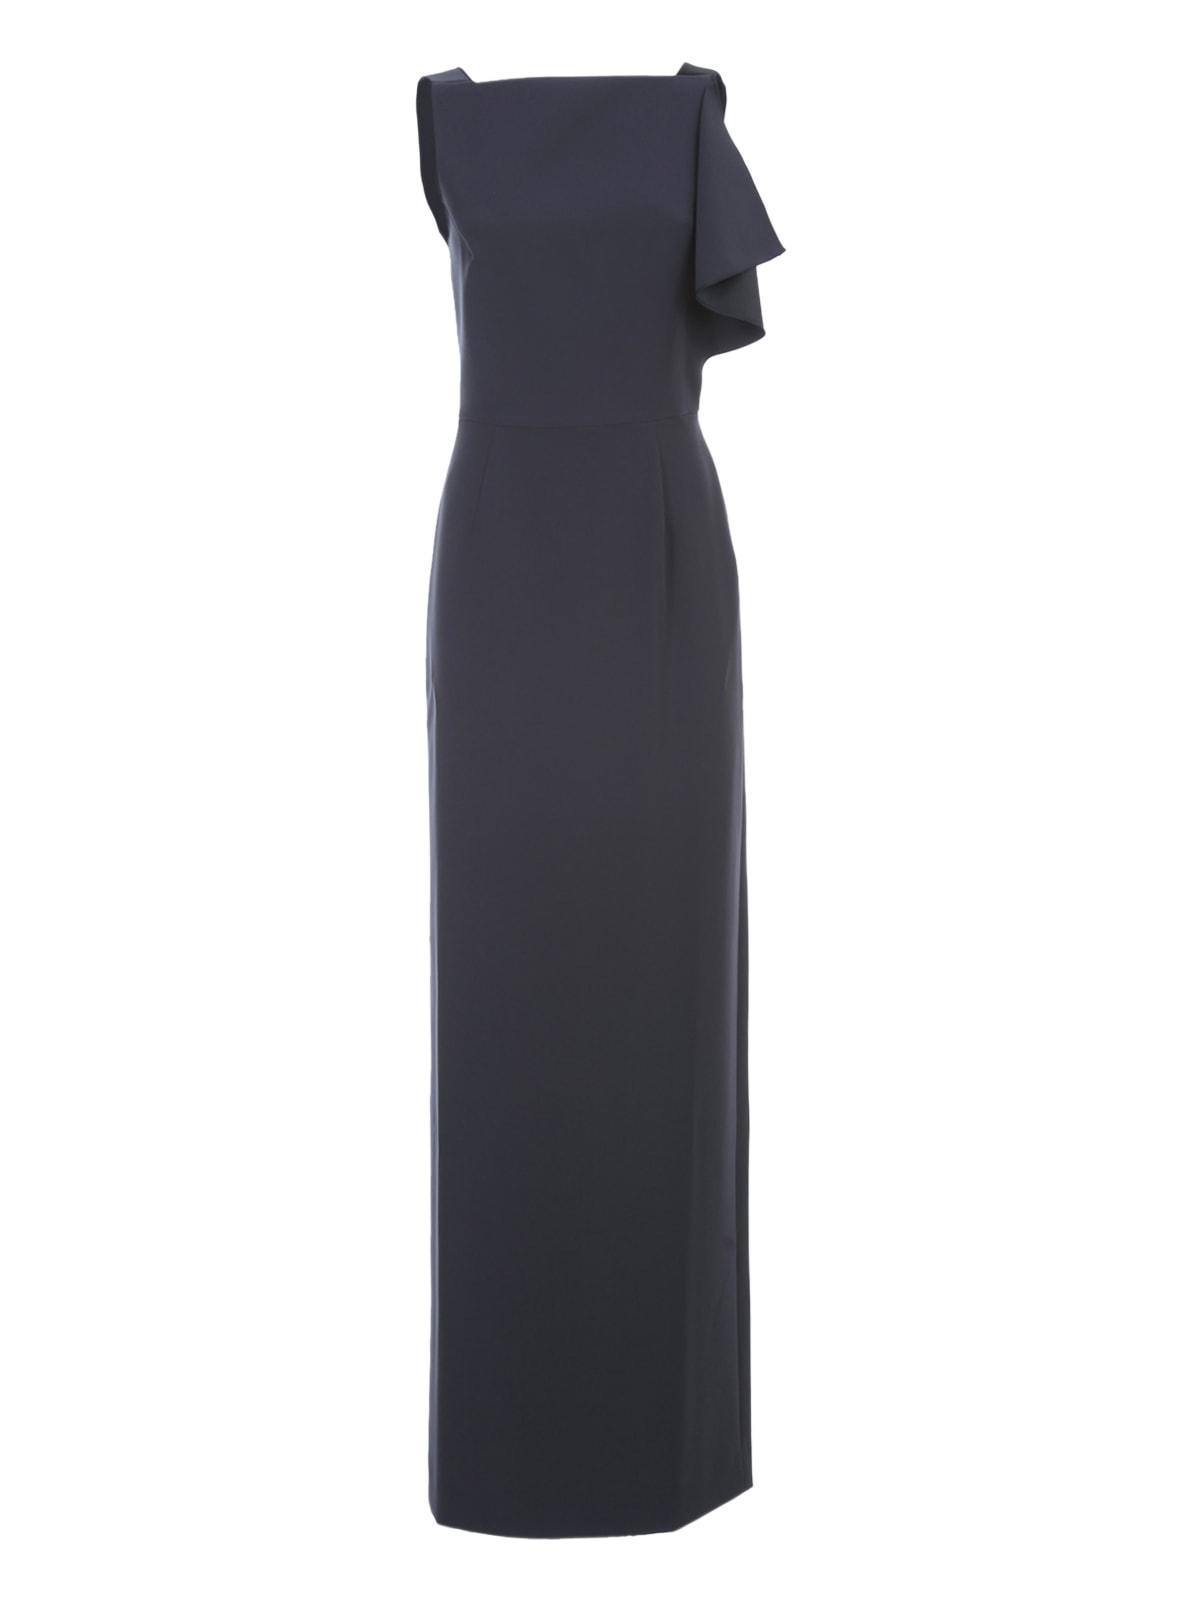 Buy Emporio Armani Maxi Dress Satin Cady online, shop Emporio Armani with free shipping